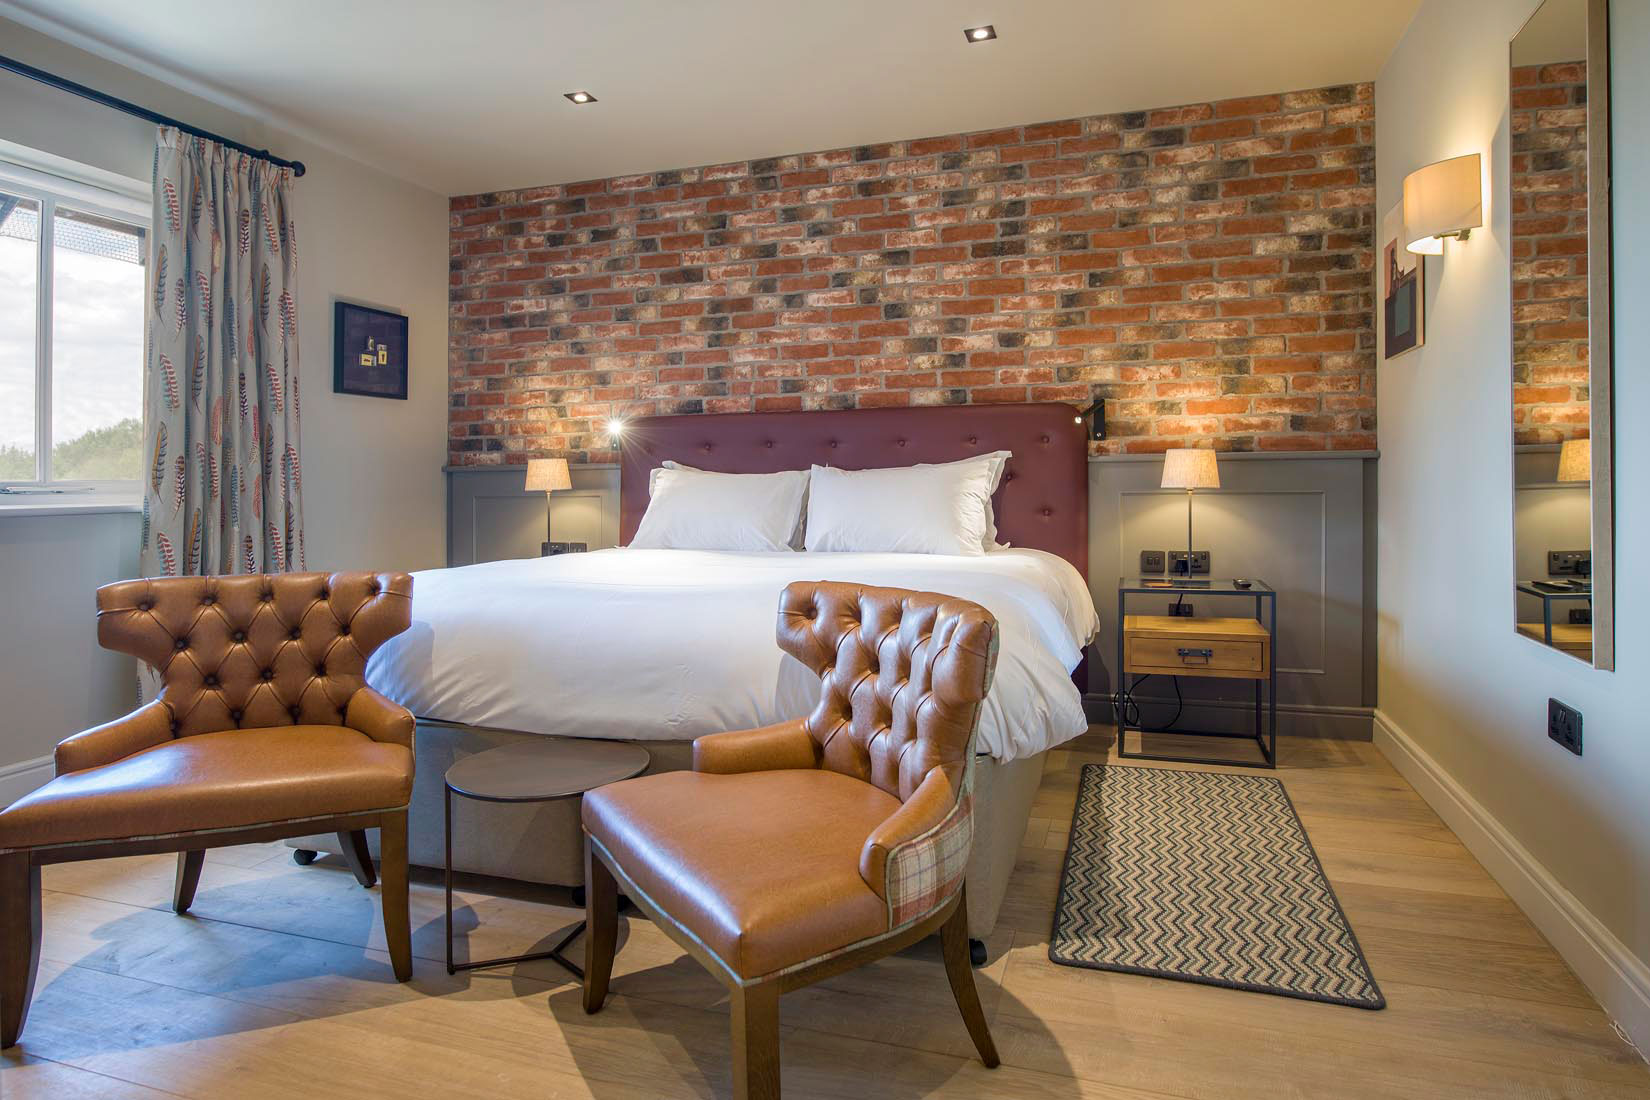 Sandburn Hall Bedroom by Rachel McLane Ltd